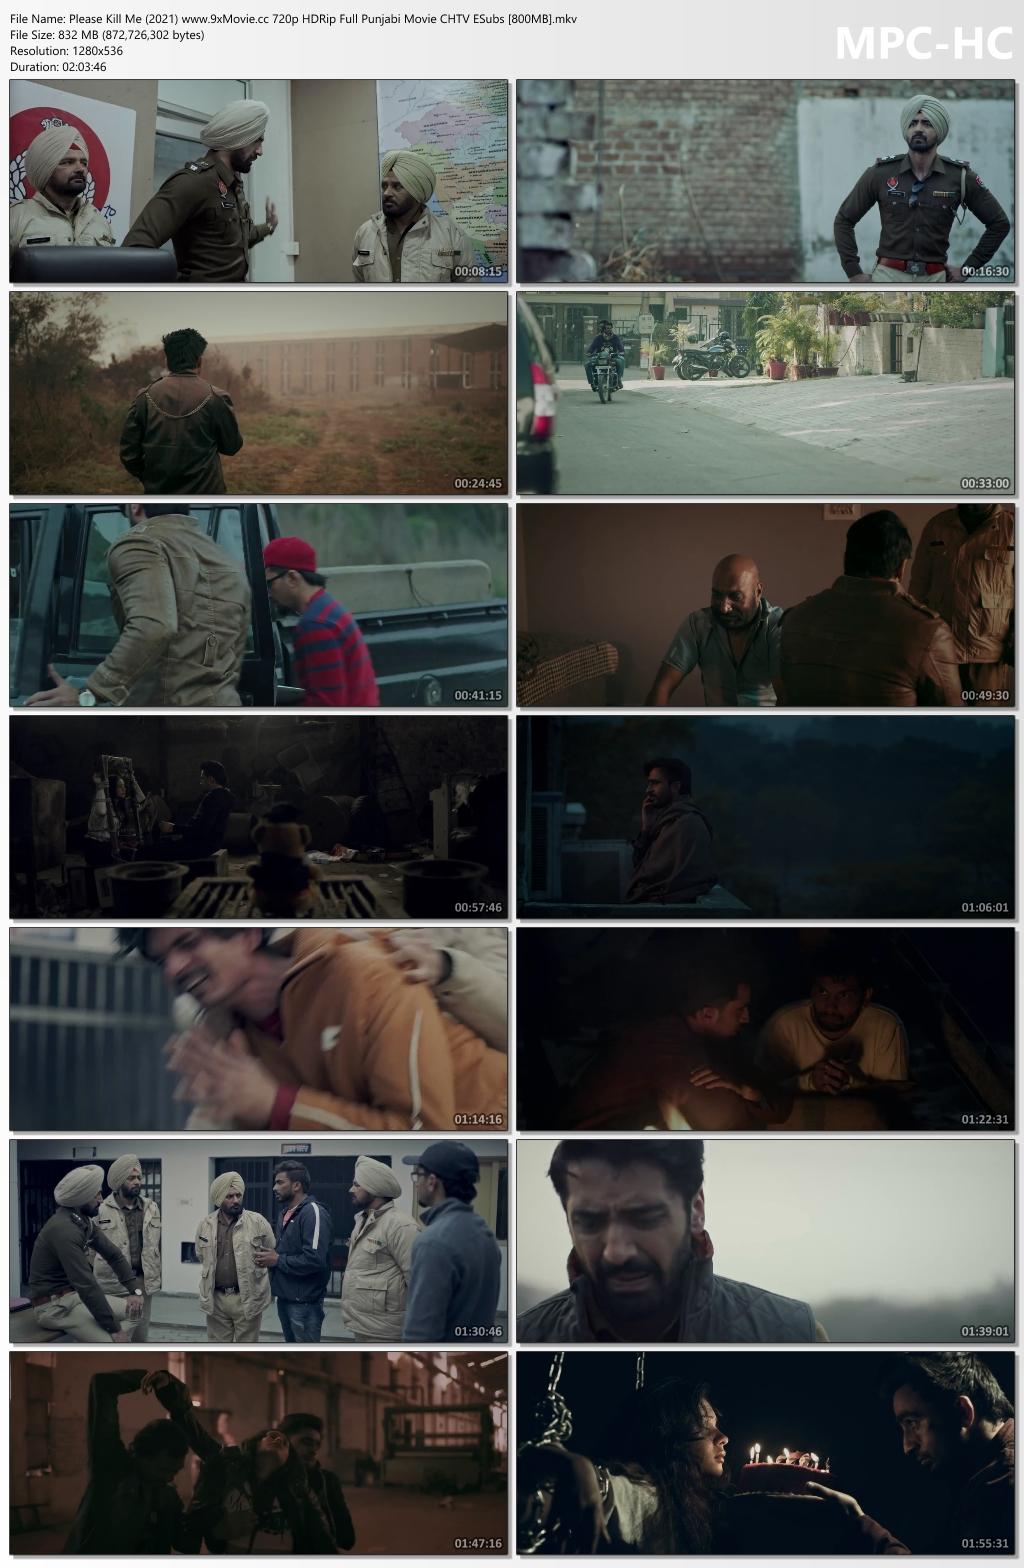 Please-Kill-Me-2021-www-9x-Movie-cc-720p-HDRip-Full-Punjabi-Movie-CHTV-ESubs-800-MB-mkv